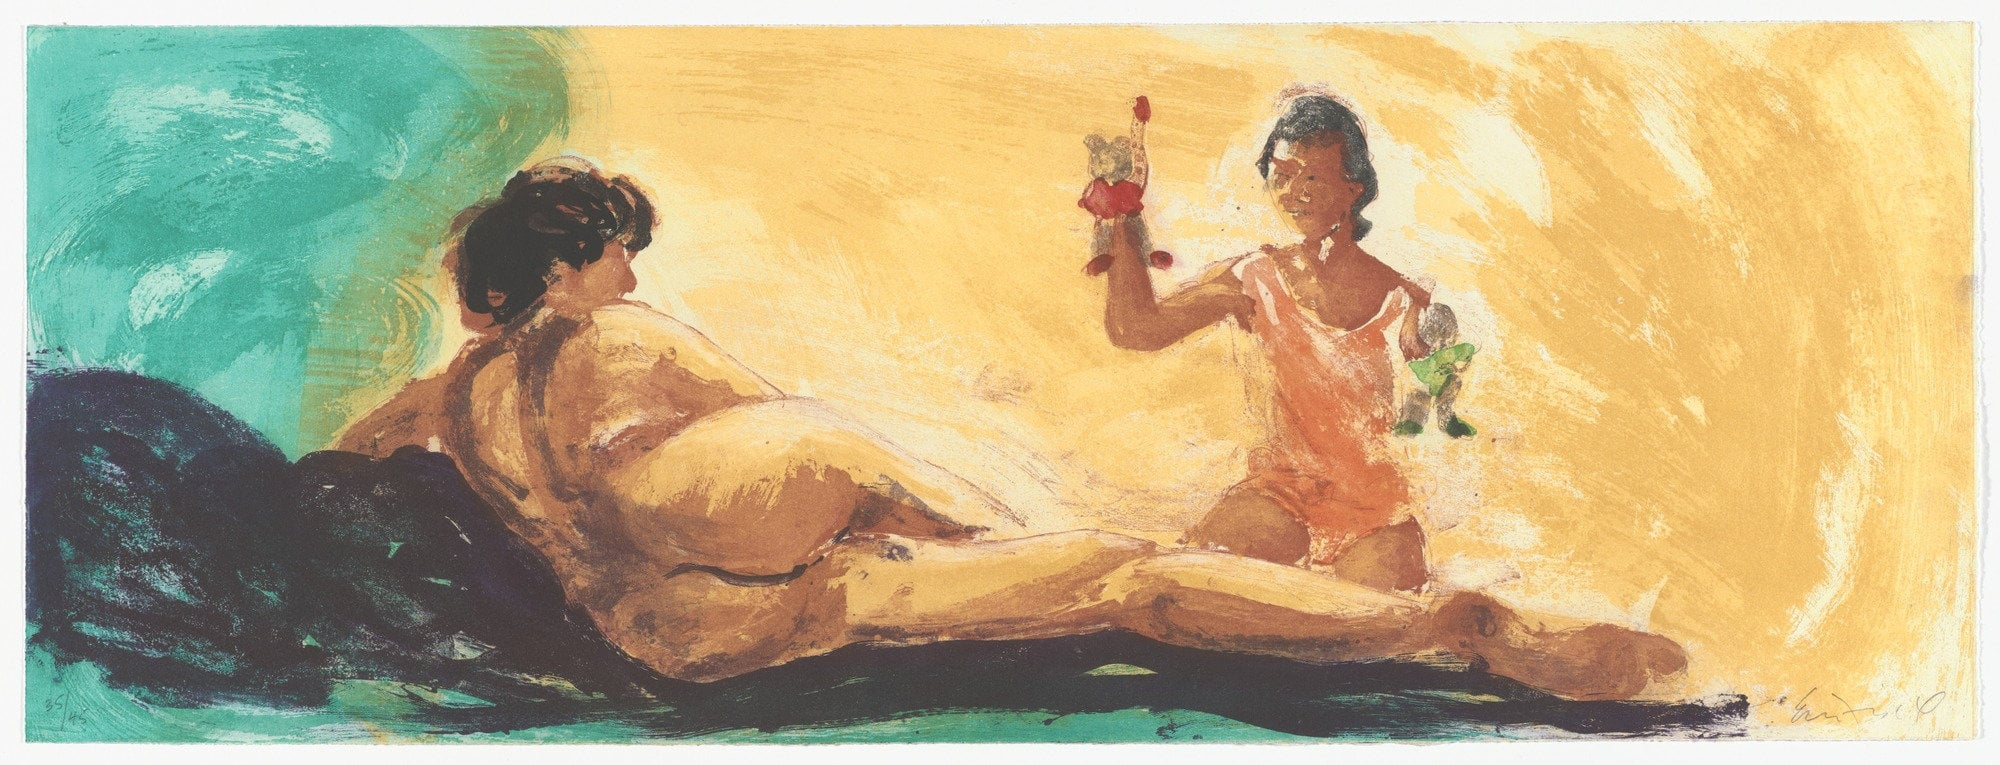 "Untitled, 1985. Aquatint. 11 5/8 x 31 9/16"" (29.5 x 80.2cm)"